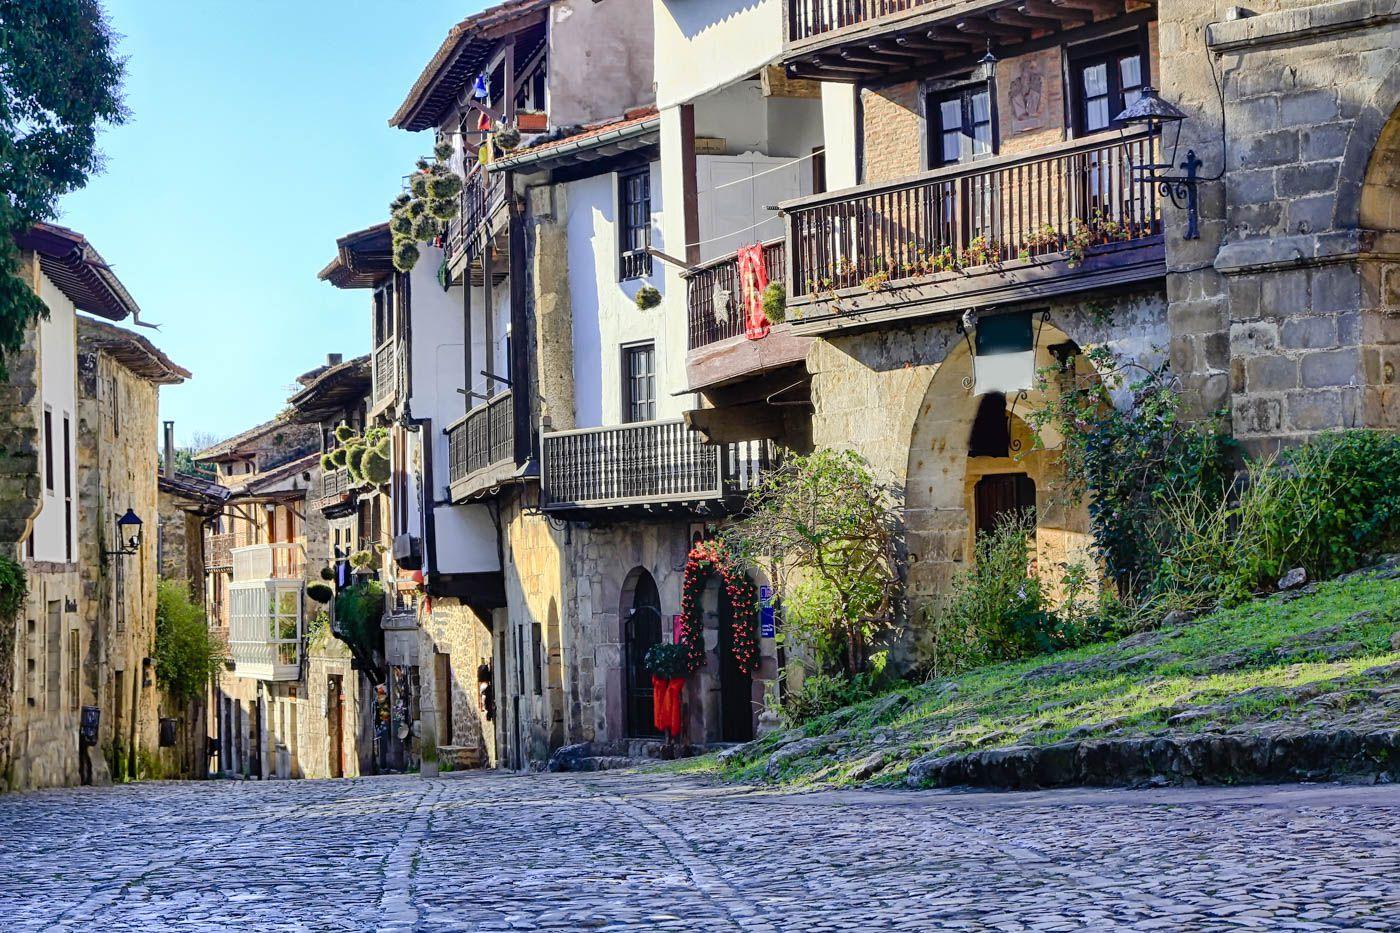 Spain Travel Costs & Prices - Tapas, Fine Wine & Paella